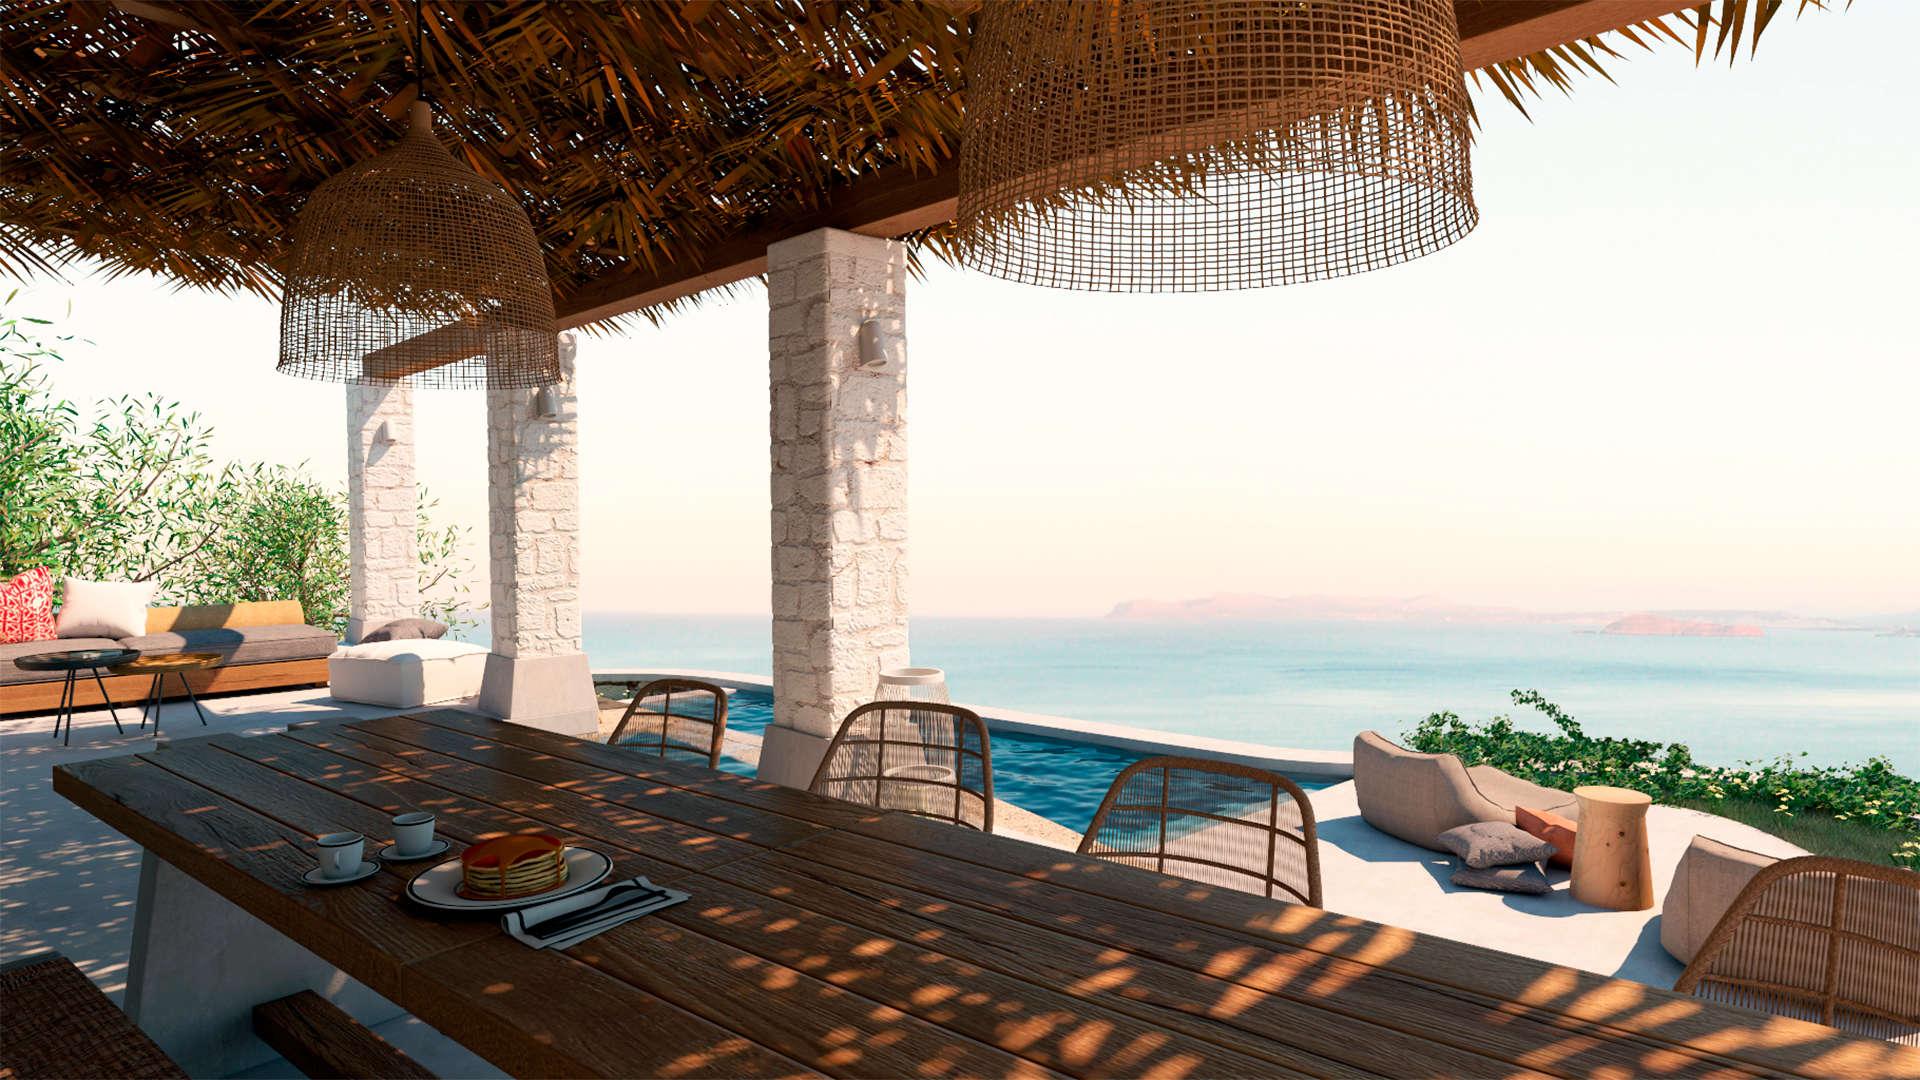 Holiday home, exterior design, pool, poolside, dinning space, Jacuzzi, sea view. Παραθεριστική κατοικία, εξωτερικοί χώροι, πισίνα, τζακούζι, τραπεζαρία, Θέα θάλασσα.